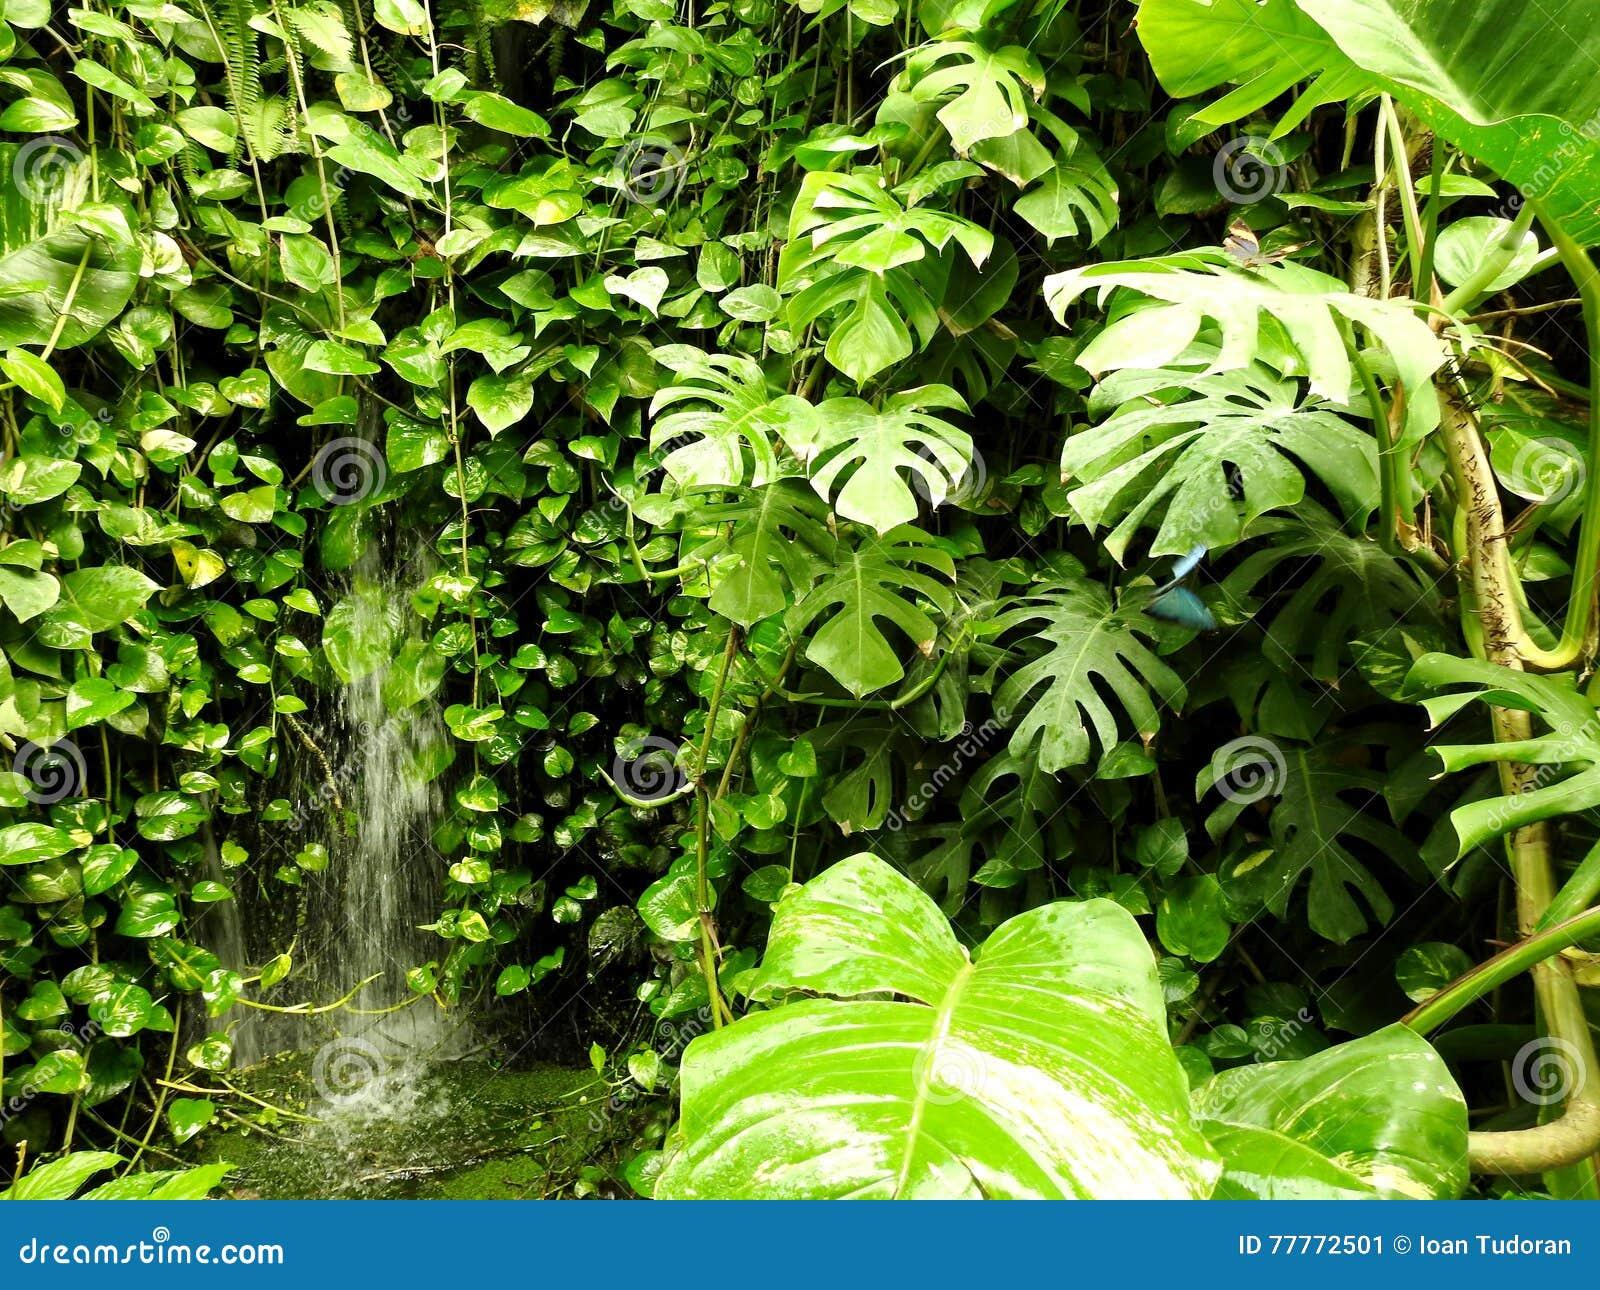 Natura, Wall Plants, Vegetation, Butterfly